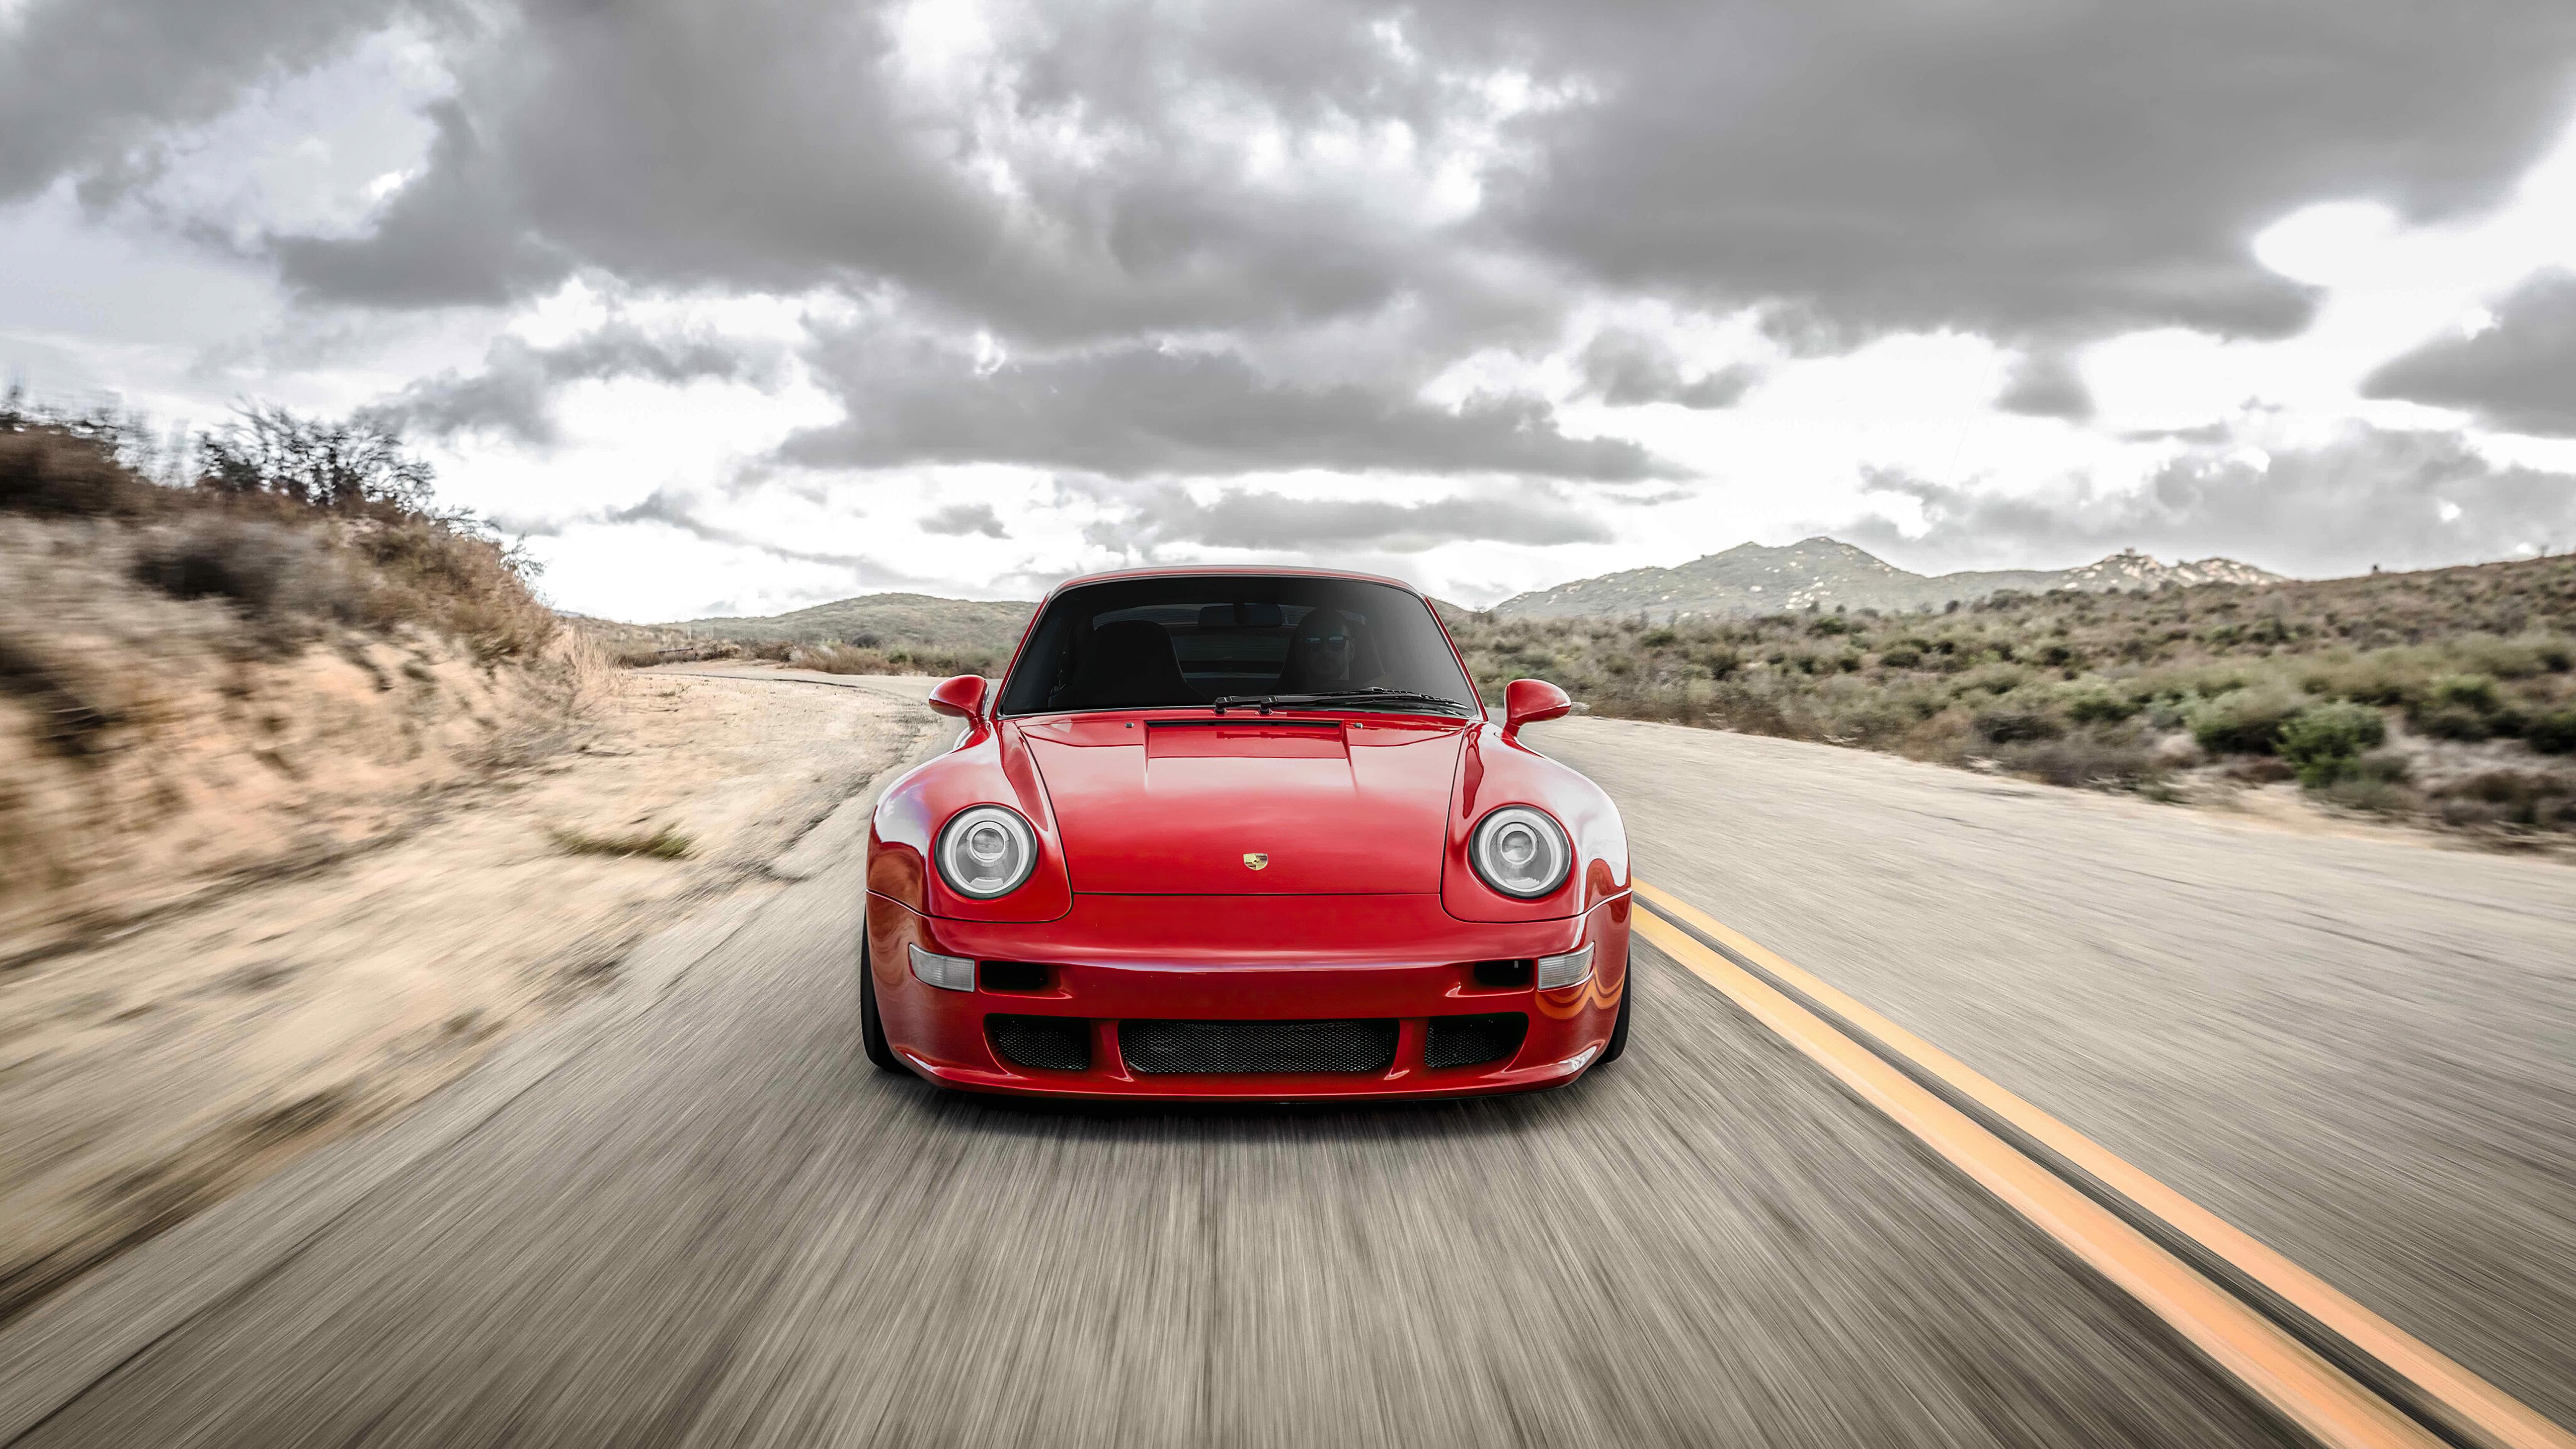 red cherry porsche 911 4k 1620170853 - Red Cherry Porsche 911 4k - Red Cherry Porsche 911 4k wallpapers